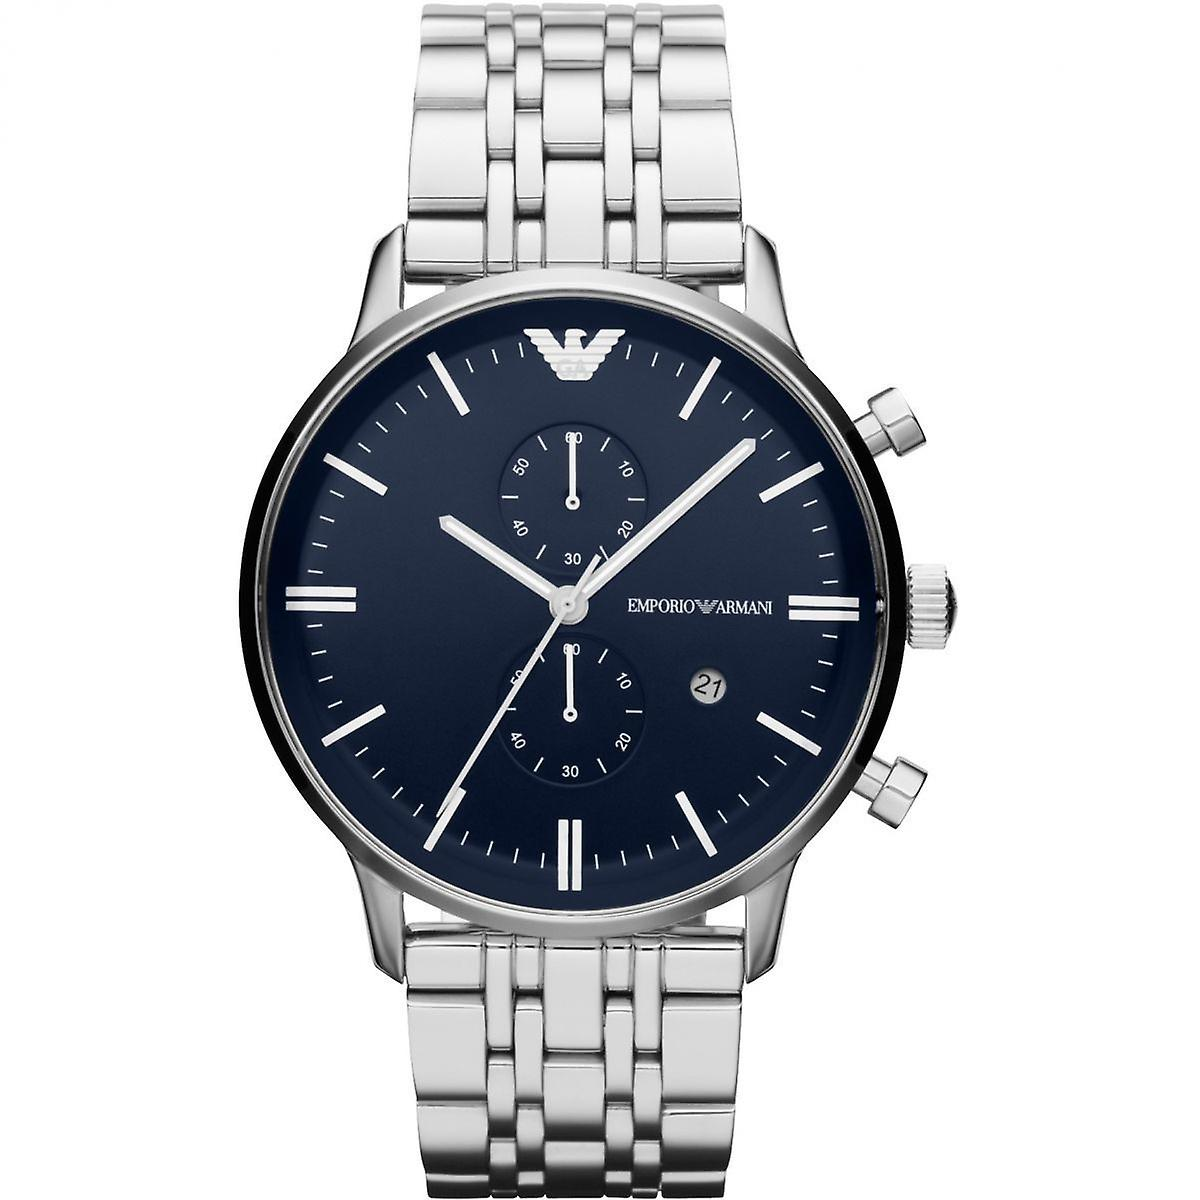 Emporio Armani Men's Chronograph Watch AR1648